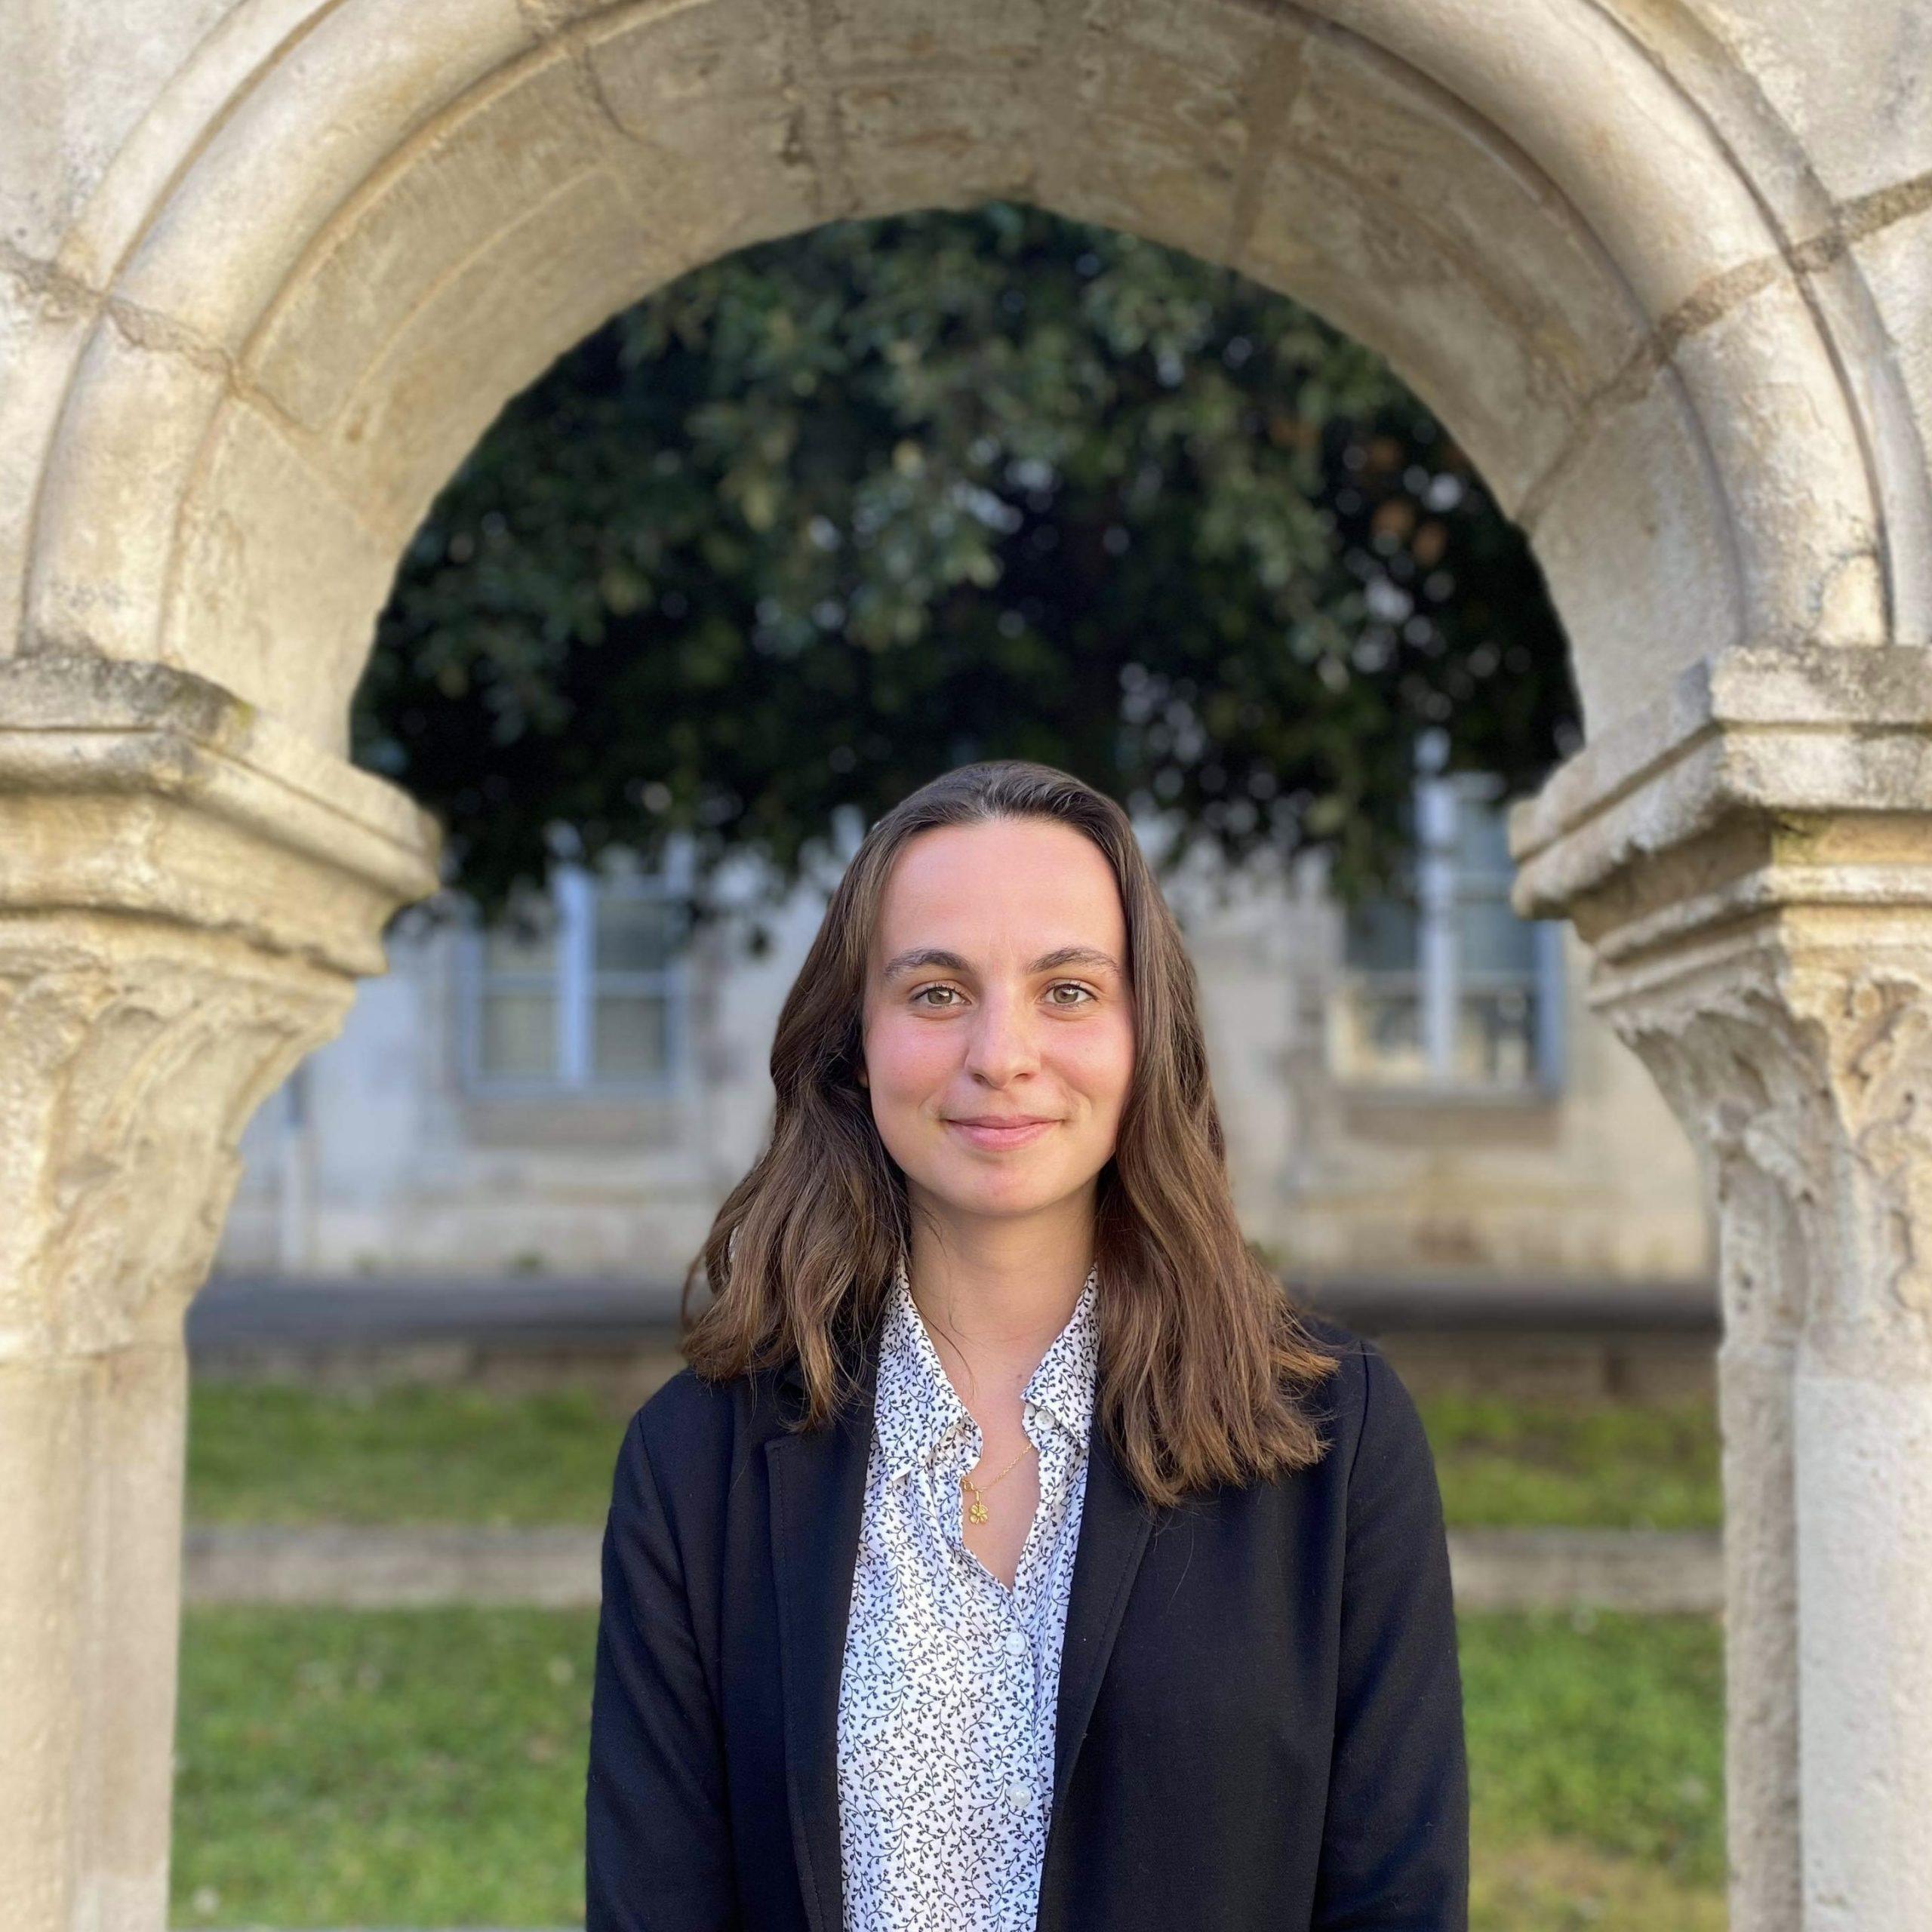 Hortense LESAICHERRE